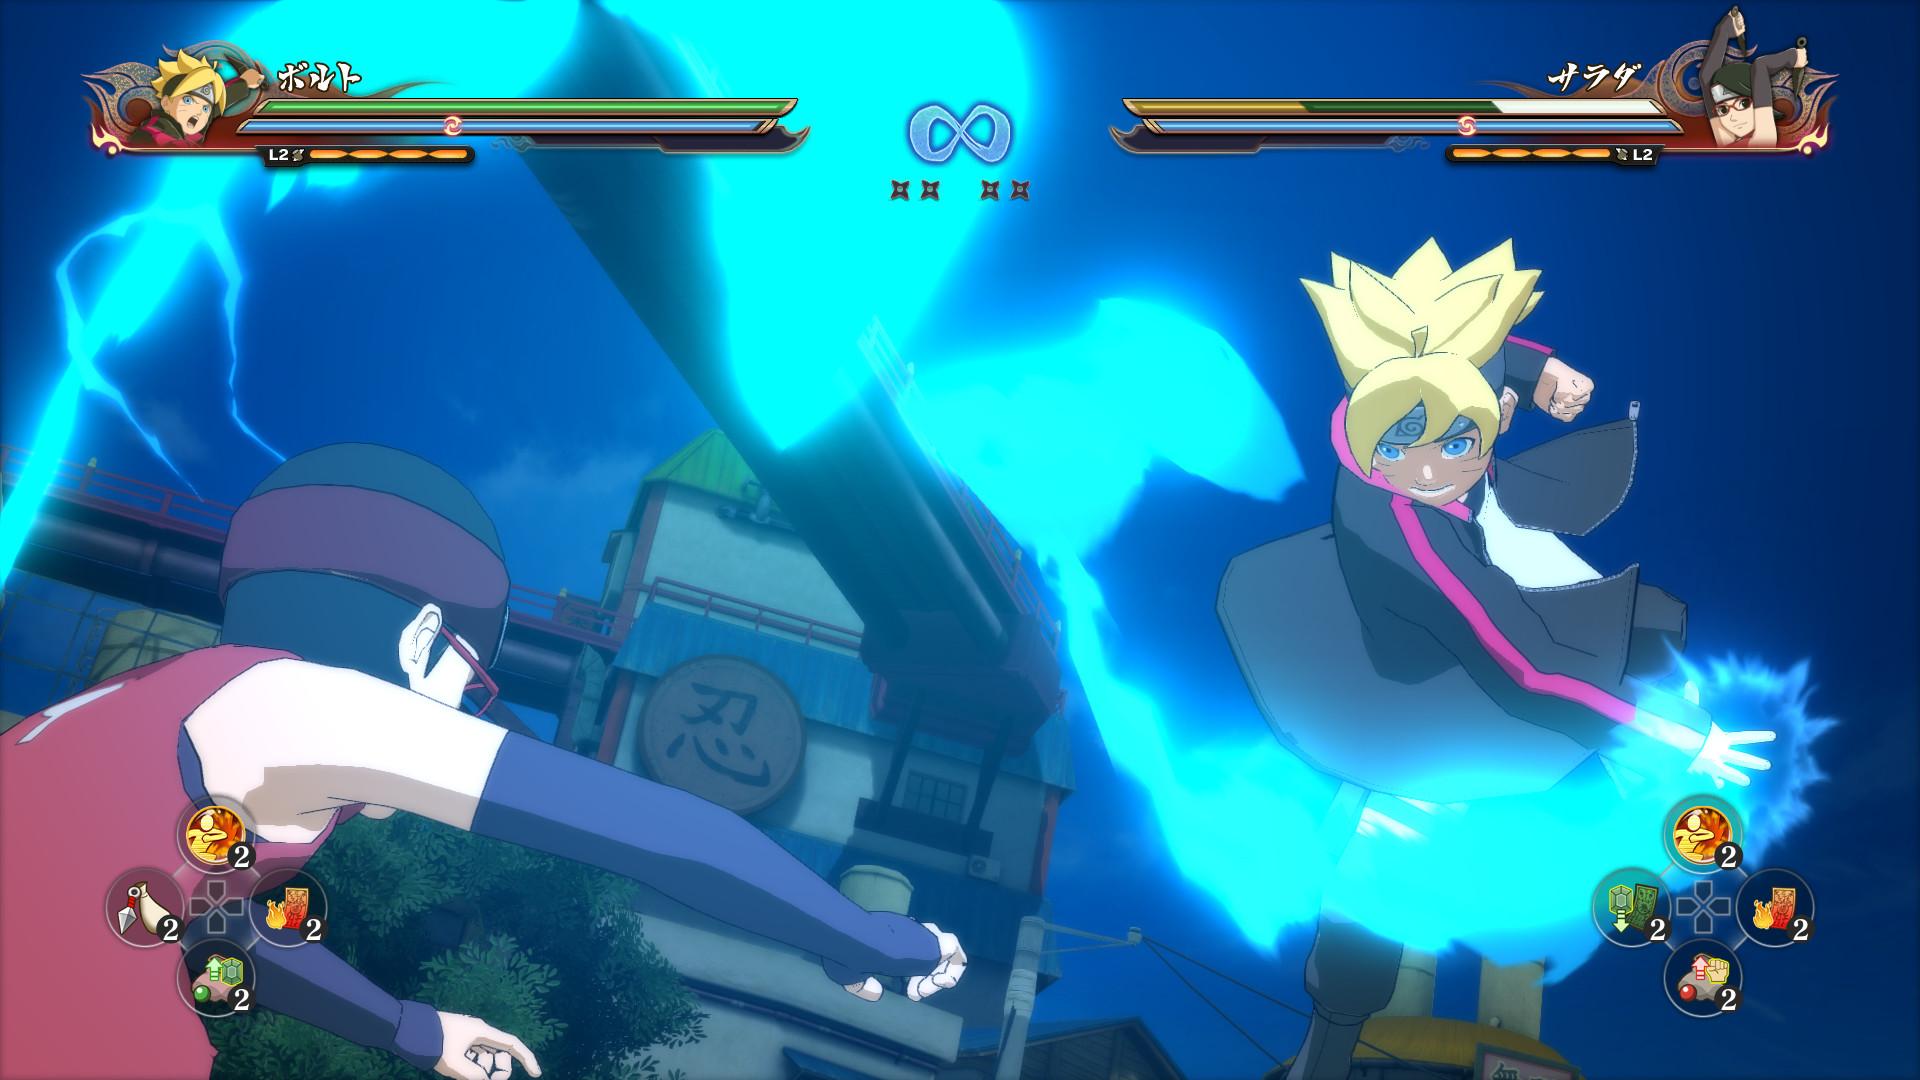 Naruto Shippuden: Ultimate Ninja Storm 4 - Road To Boruto DLC (2DVD) |  Hommy Games